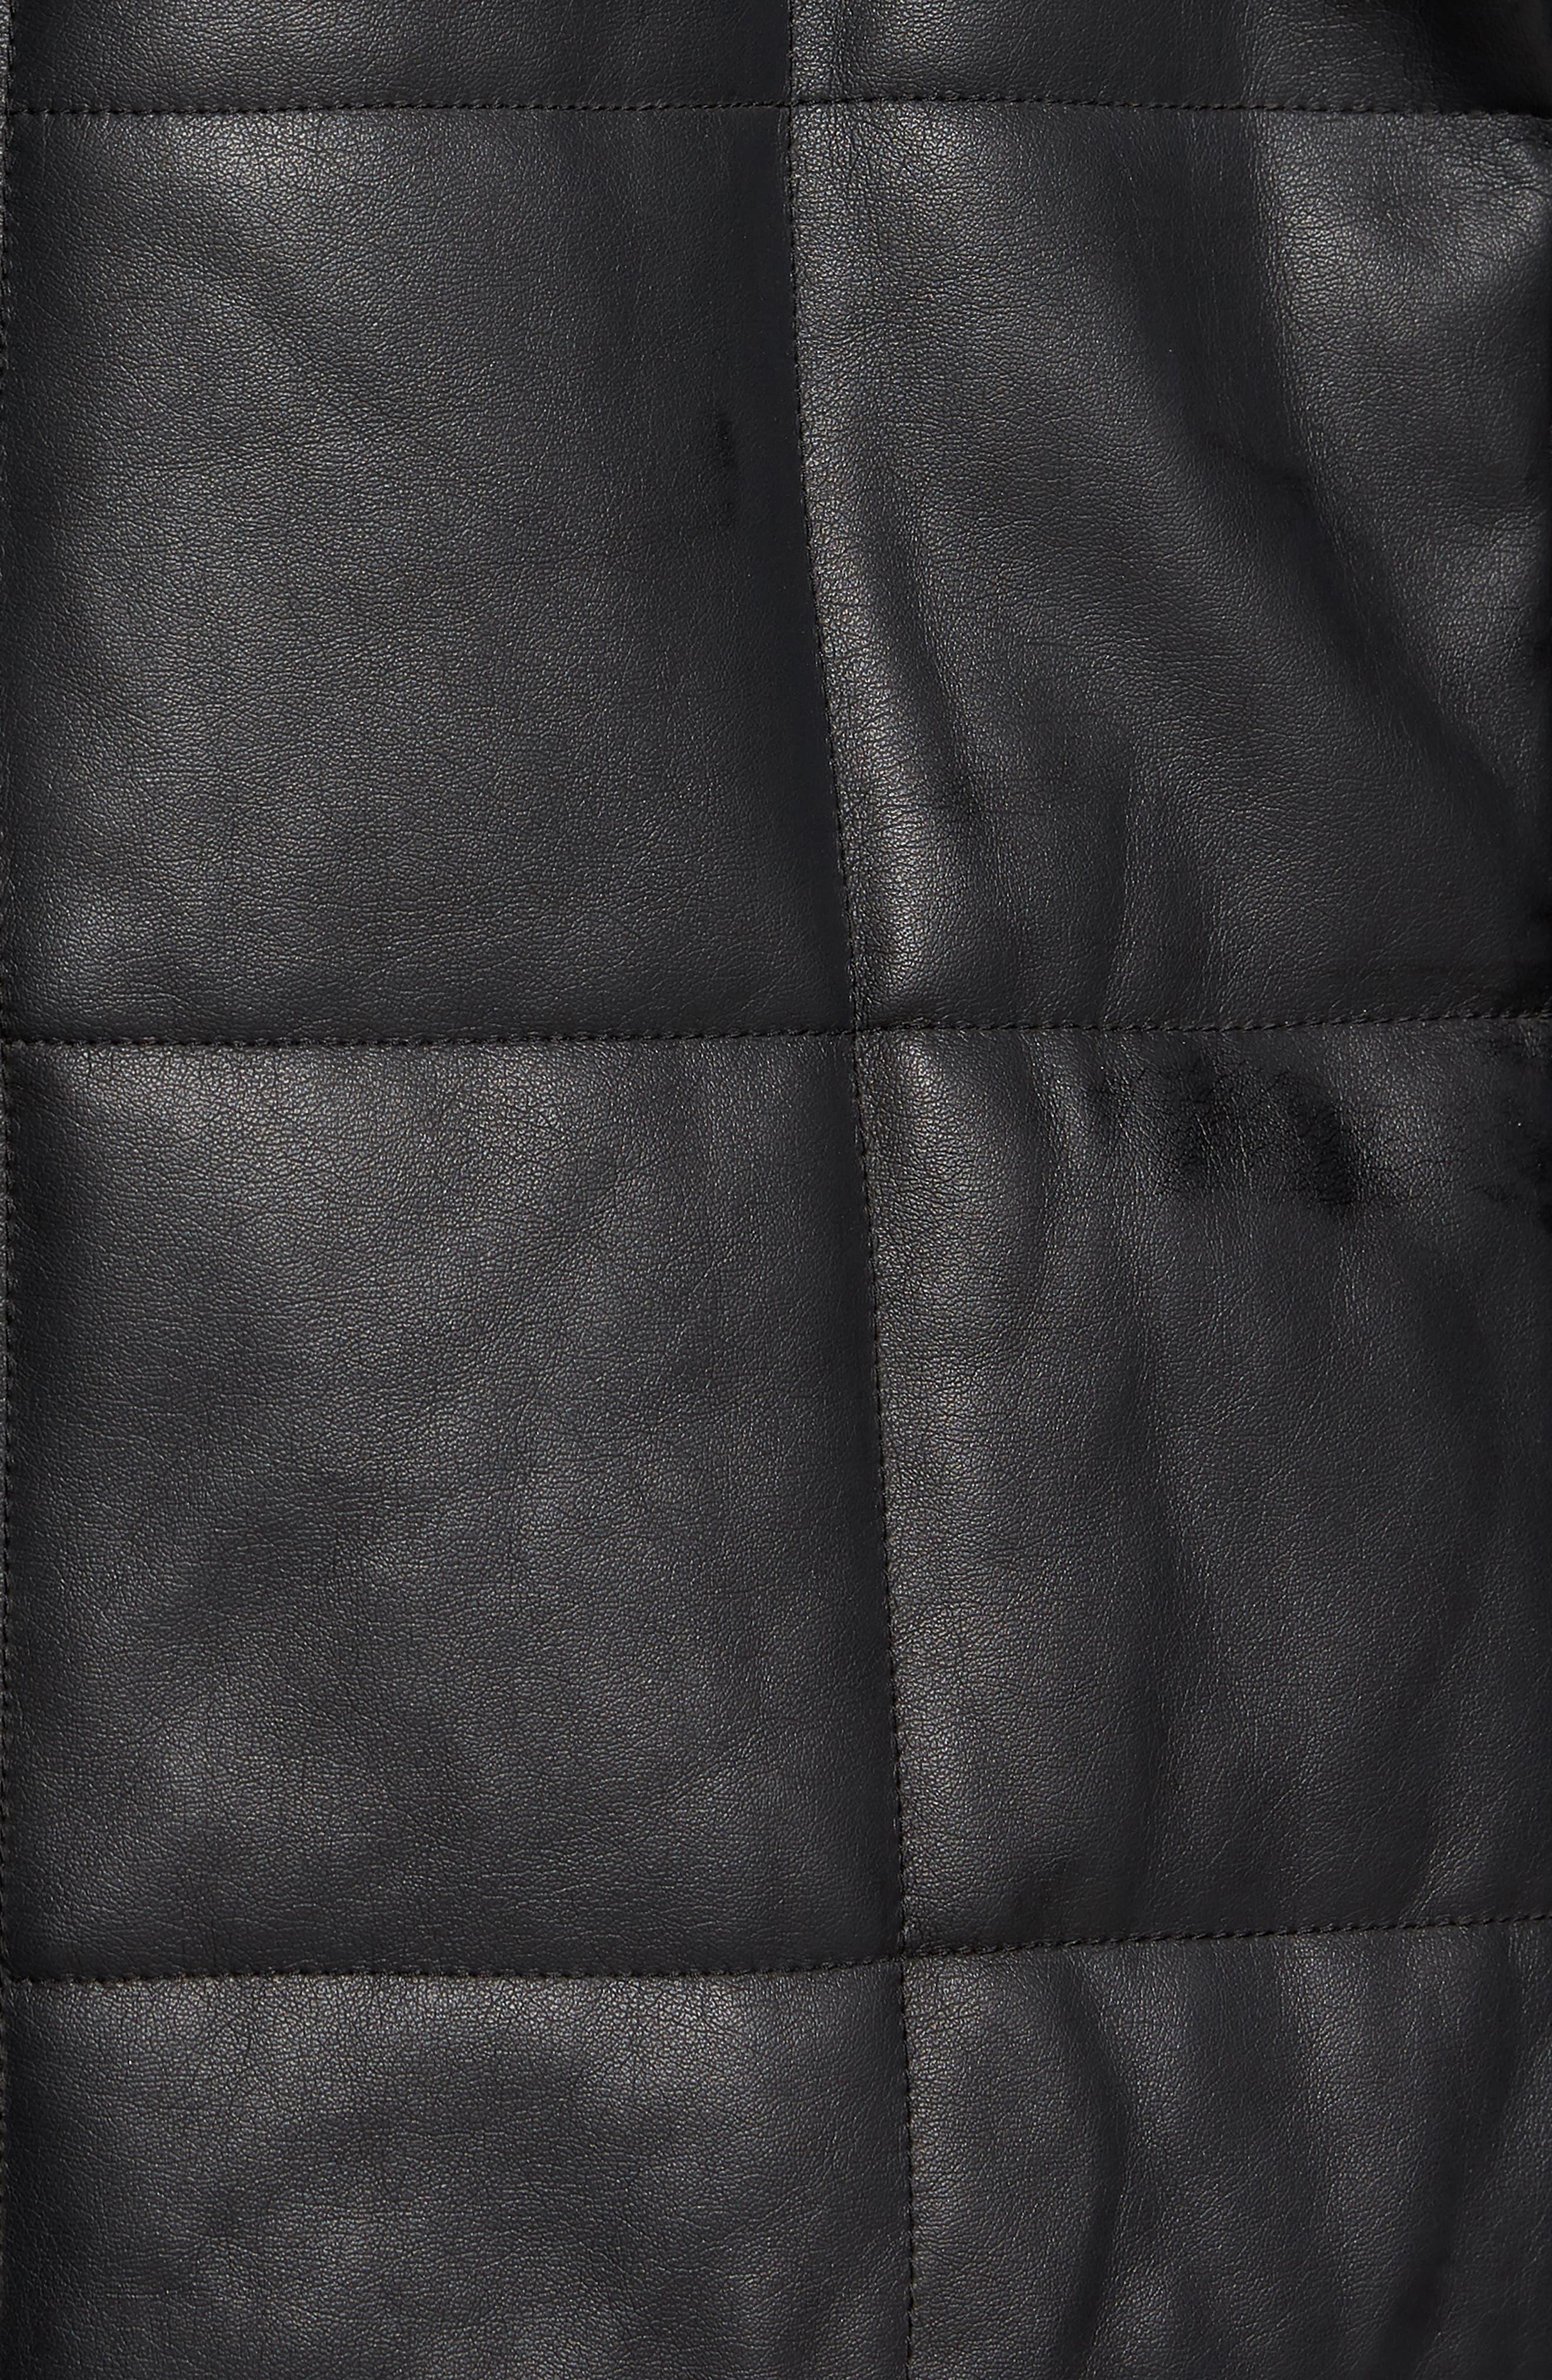 Quilted Convertible Vest/Jacket,                             Alternate thumbnail 6, color,                             BLACK